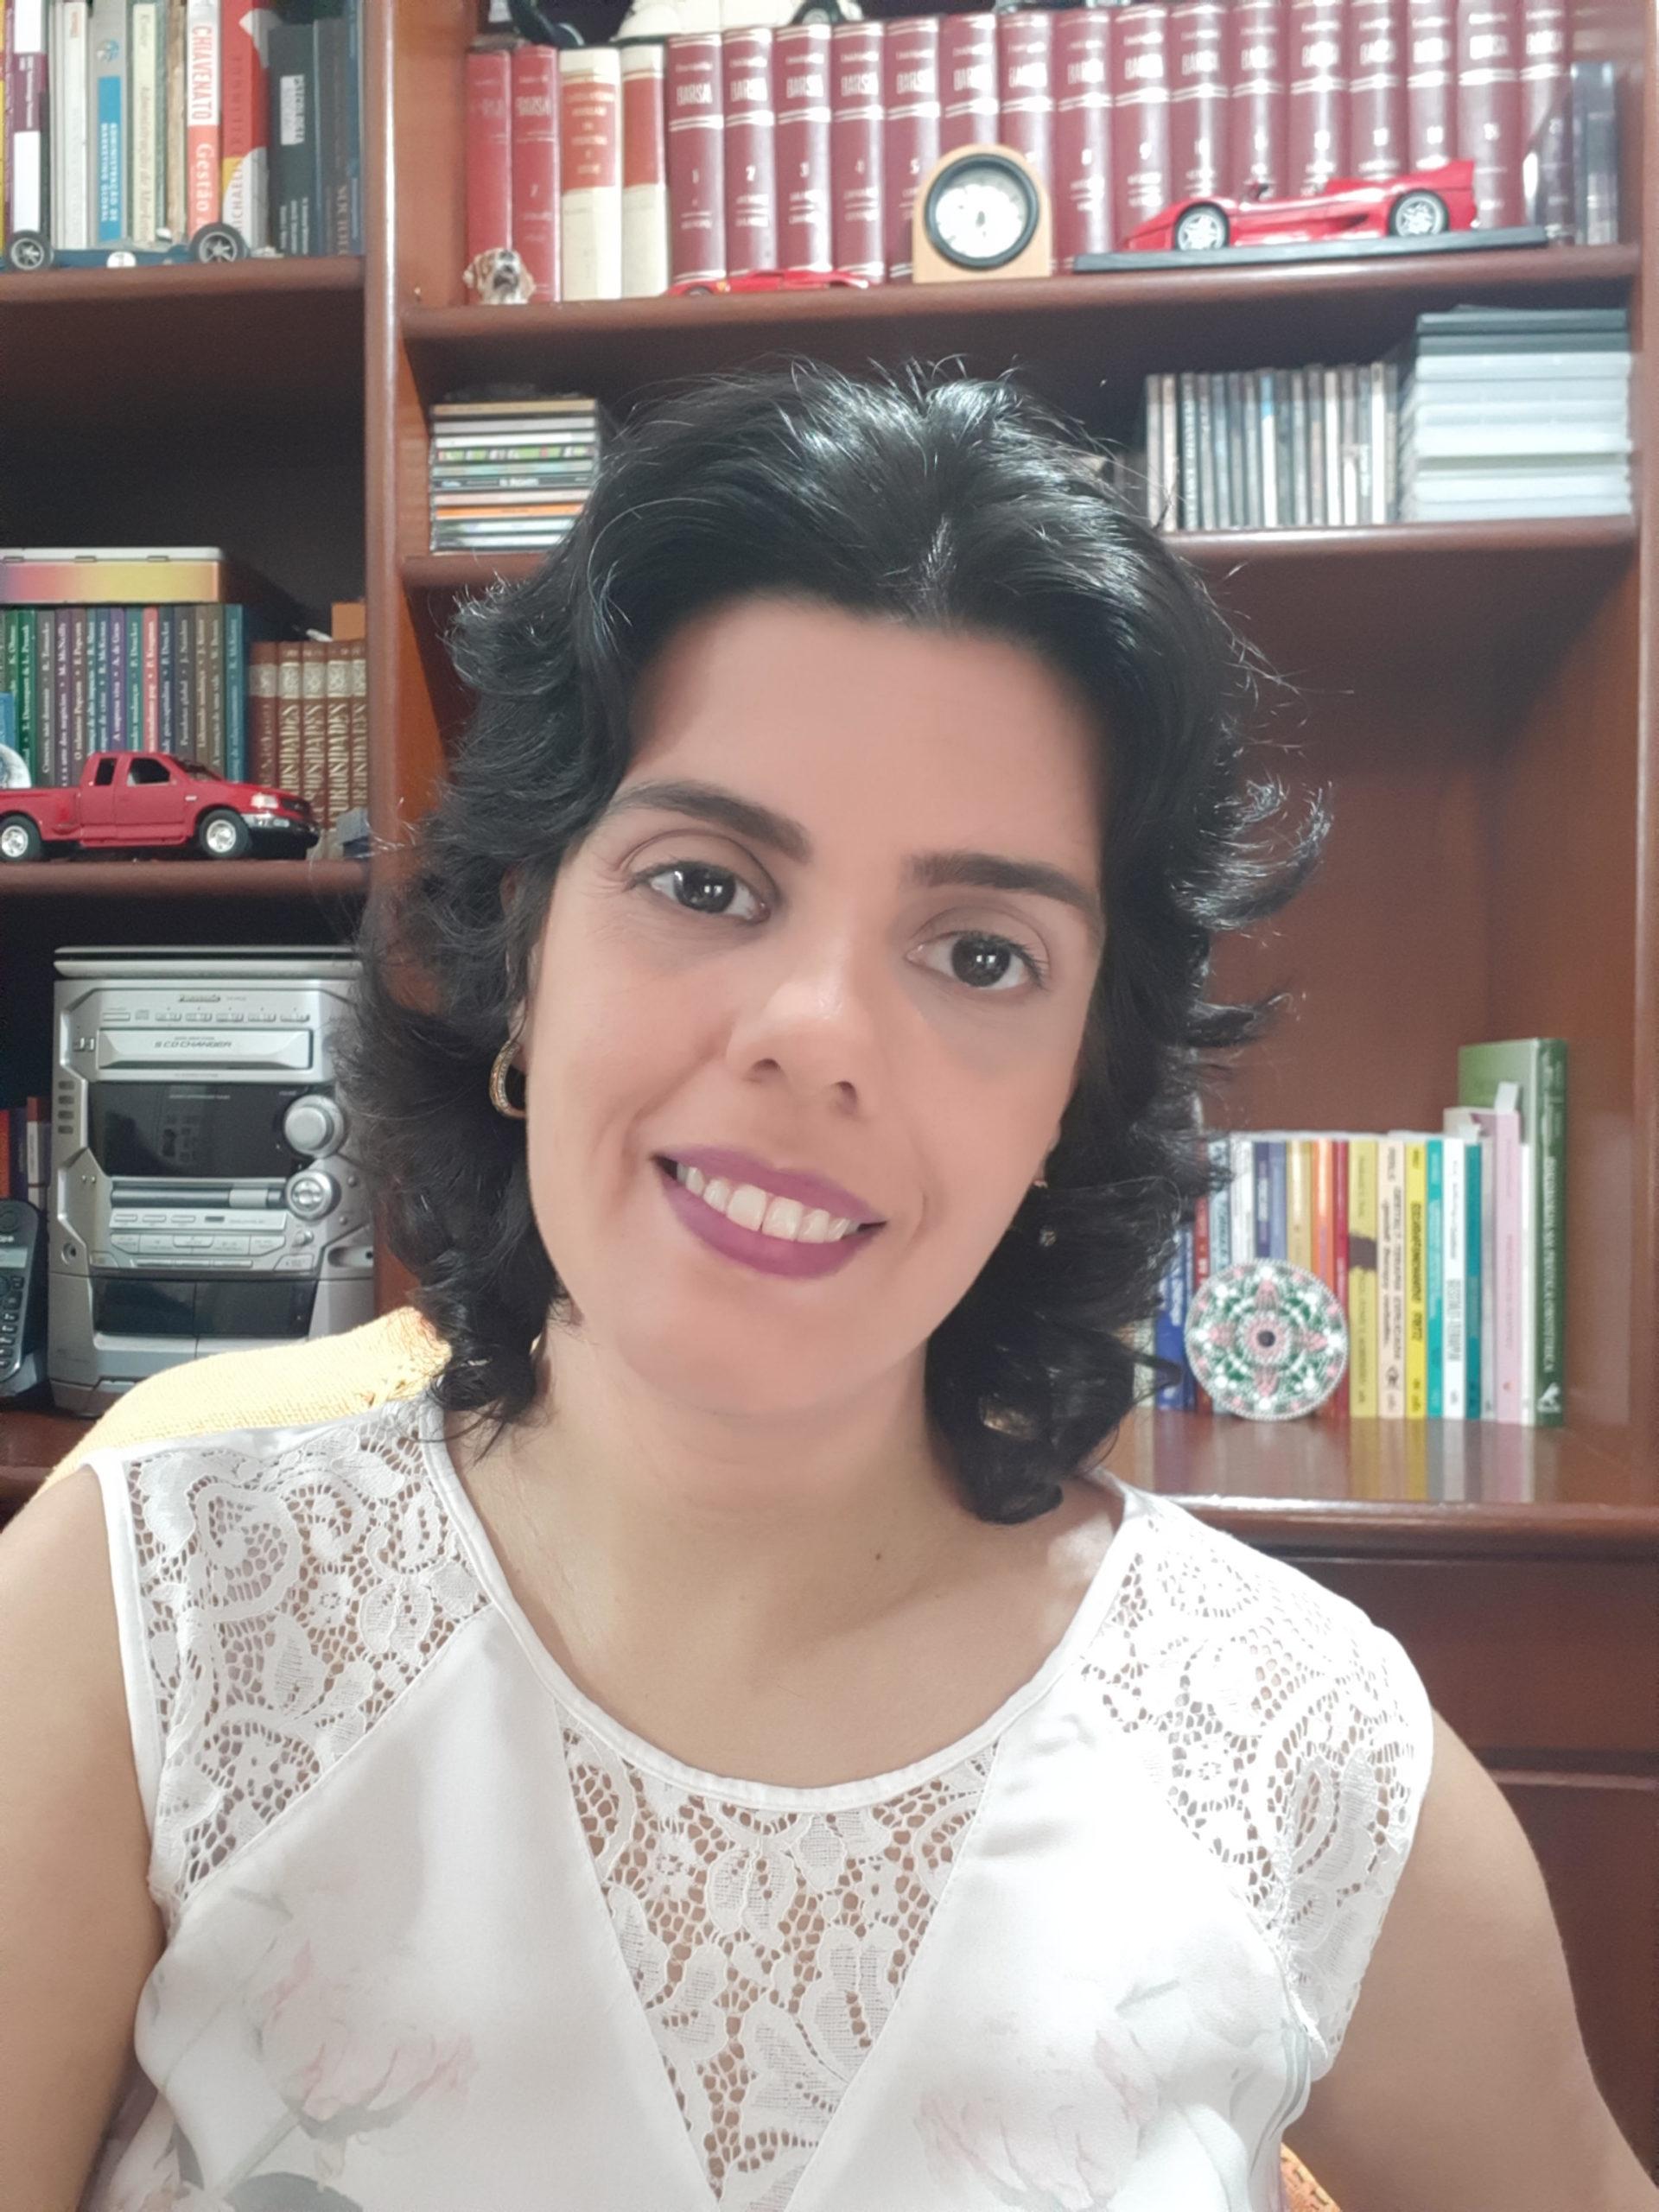 Luciana Lopes de Magalhães